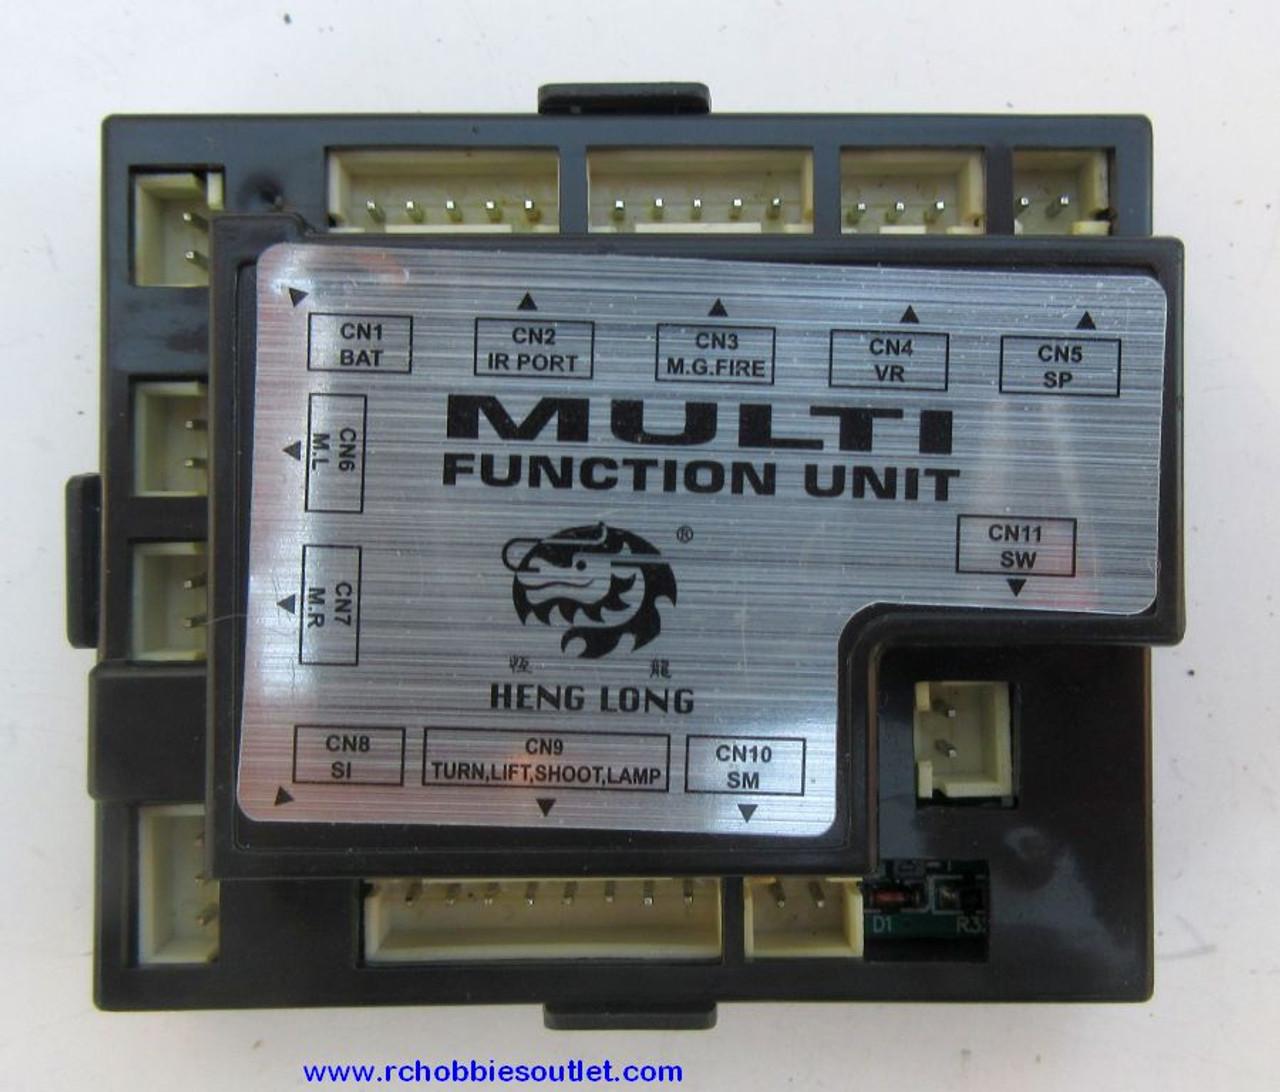 Heng Long Tank Multi-Function Unit